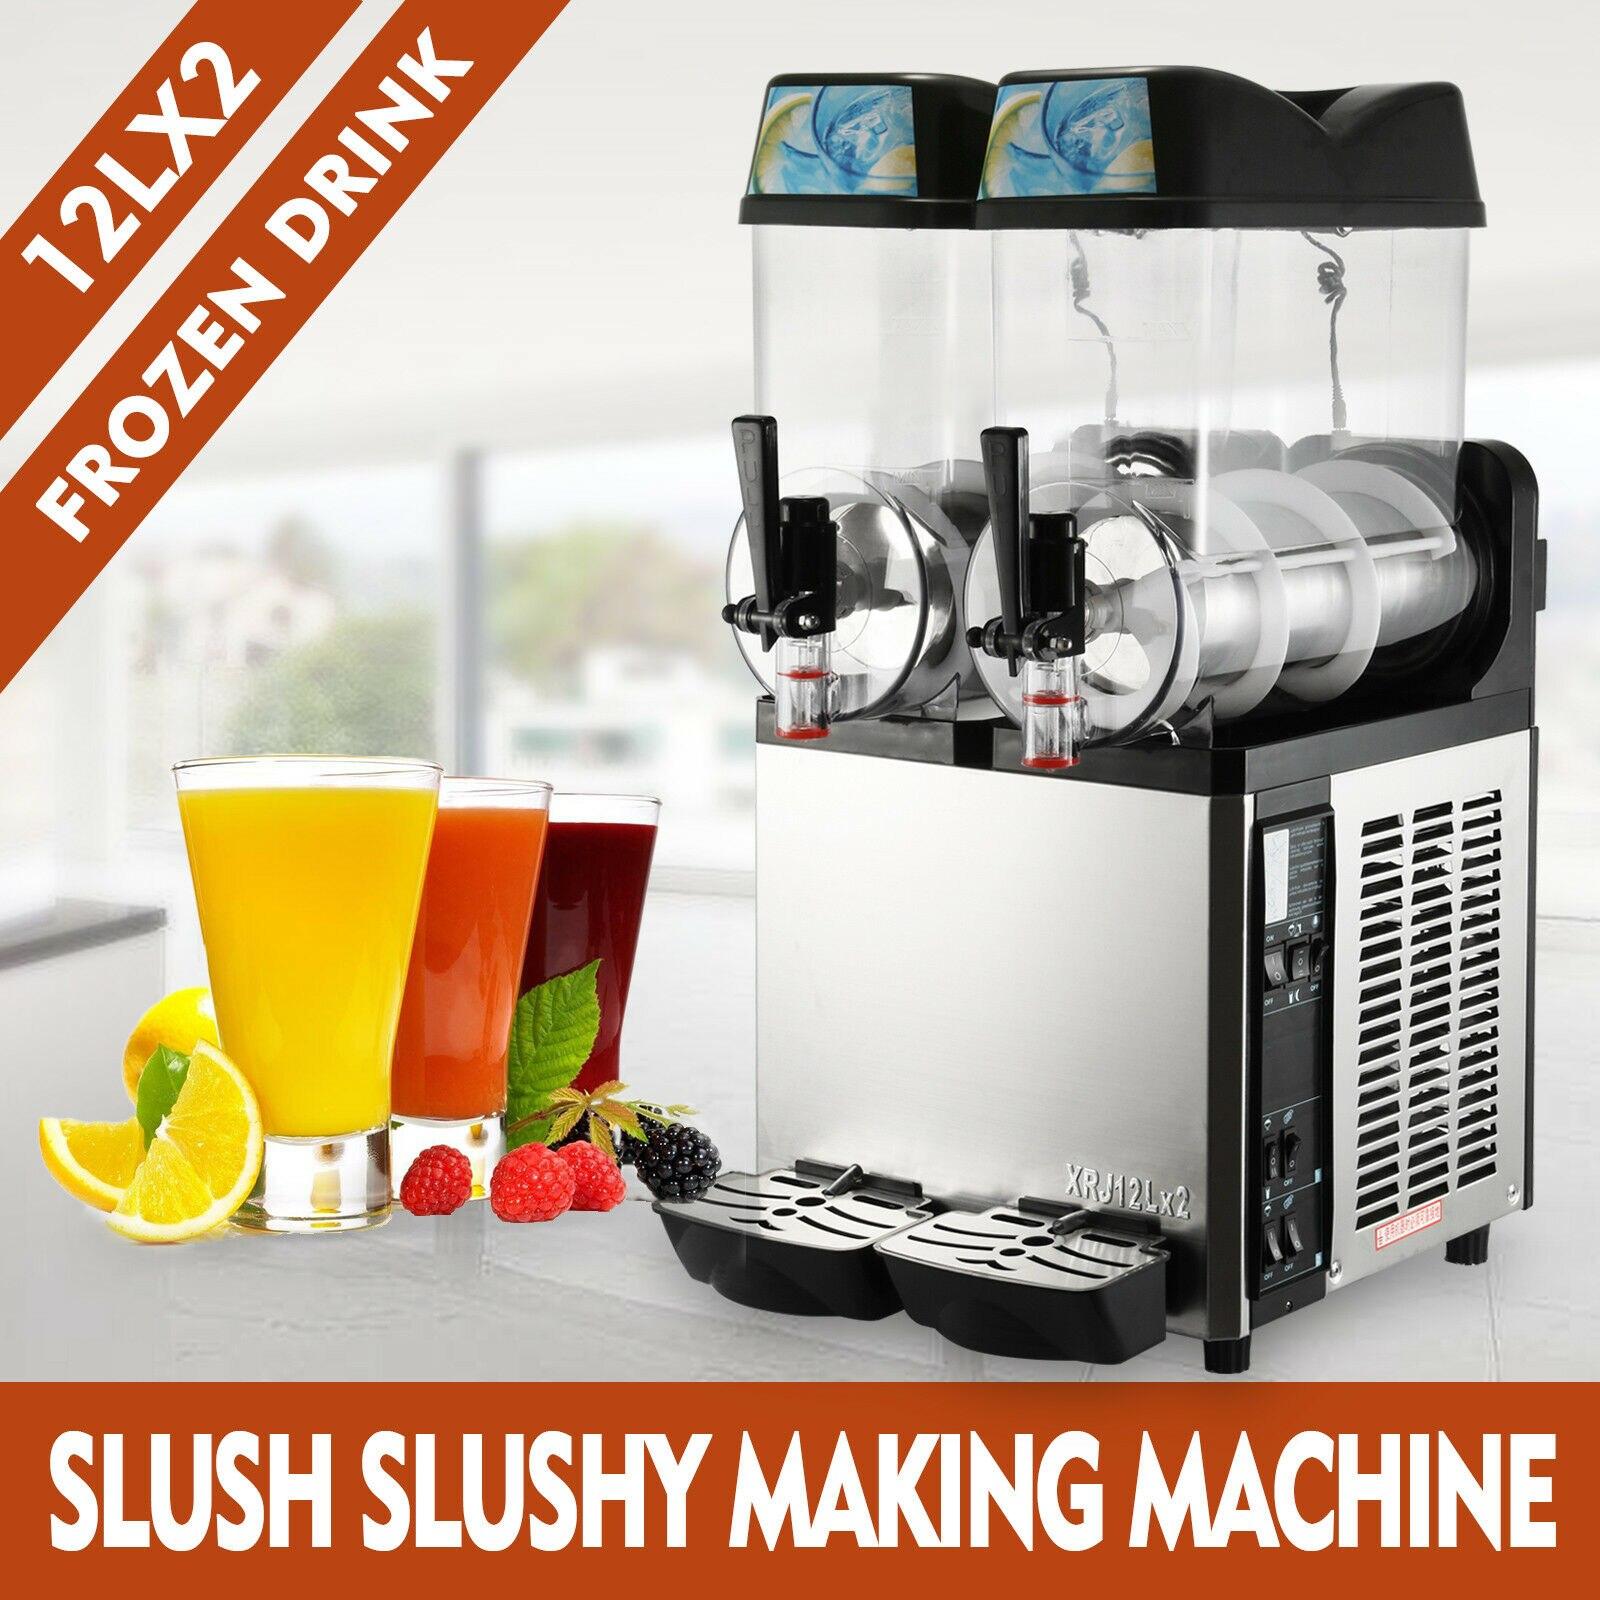 2×12L Commercial Froze Drink Slush Slushy Machine Slurpee Margarita 2 Tanks